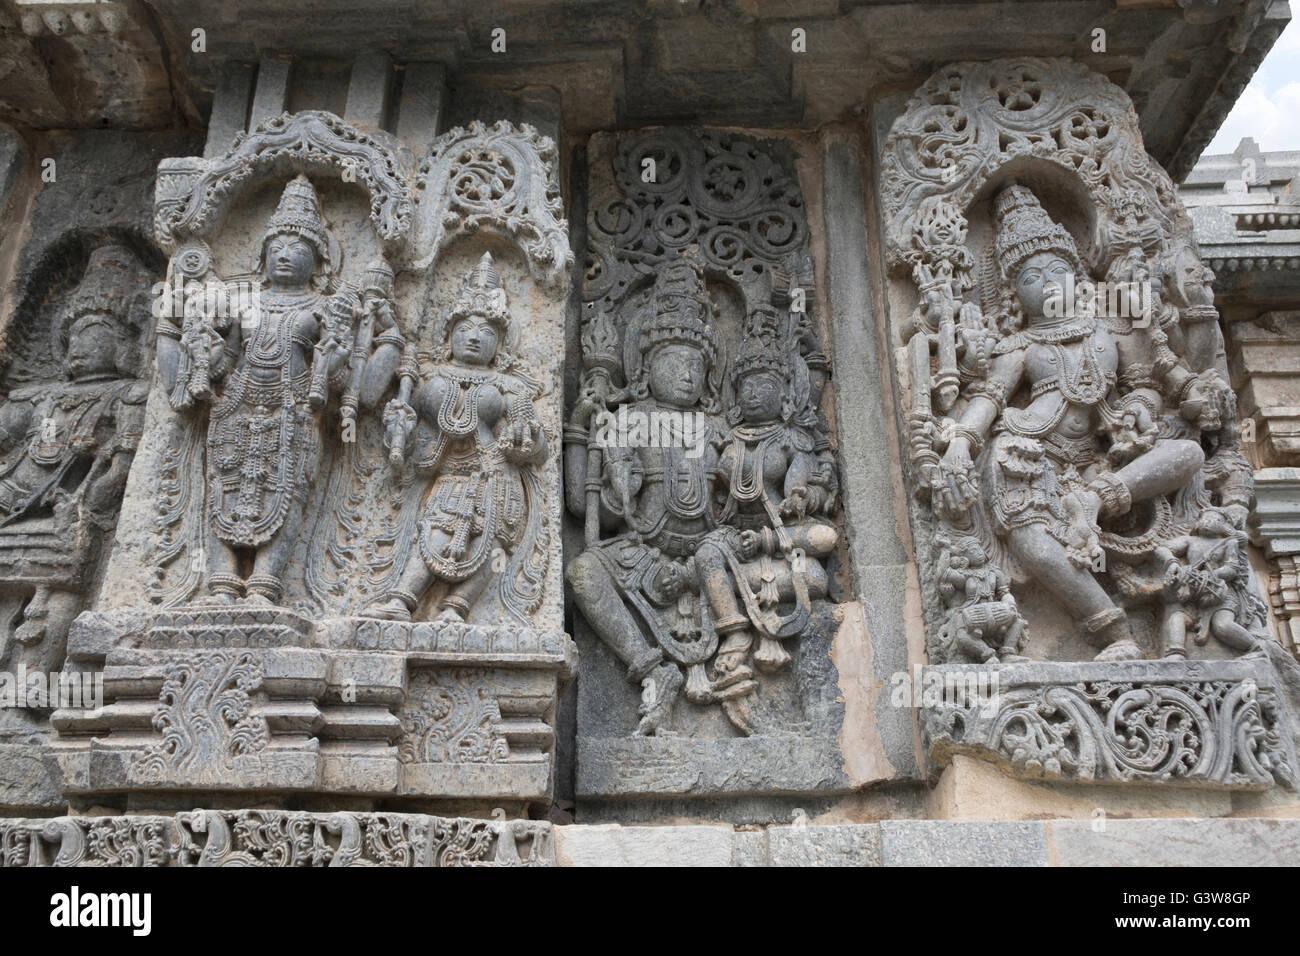 Ornate bas relief and sculptures of Hindu deities, Kedareshwara Temple, Halebid, Karnataka, india. - Stock Image